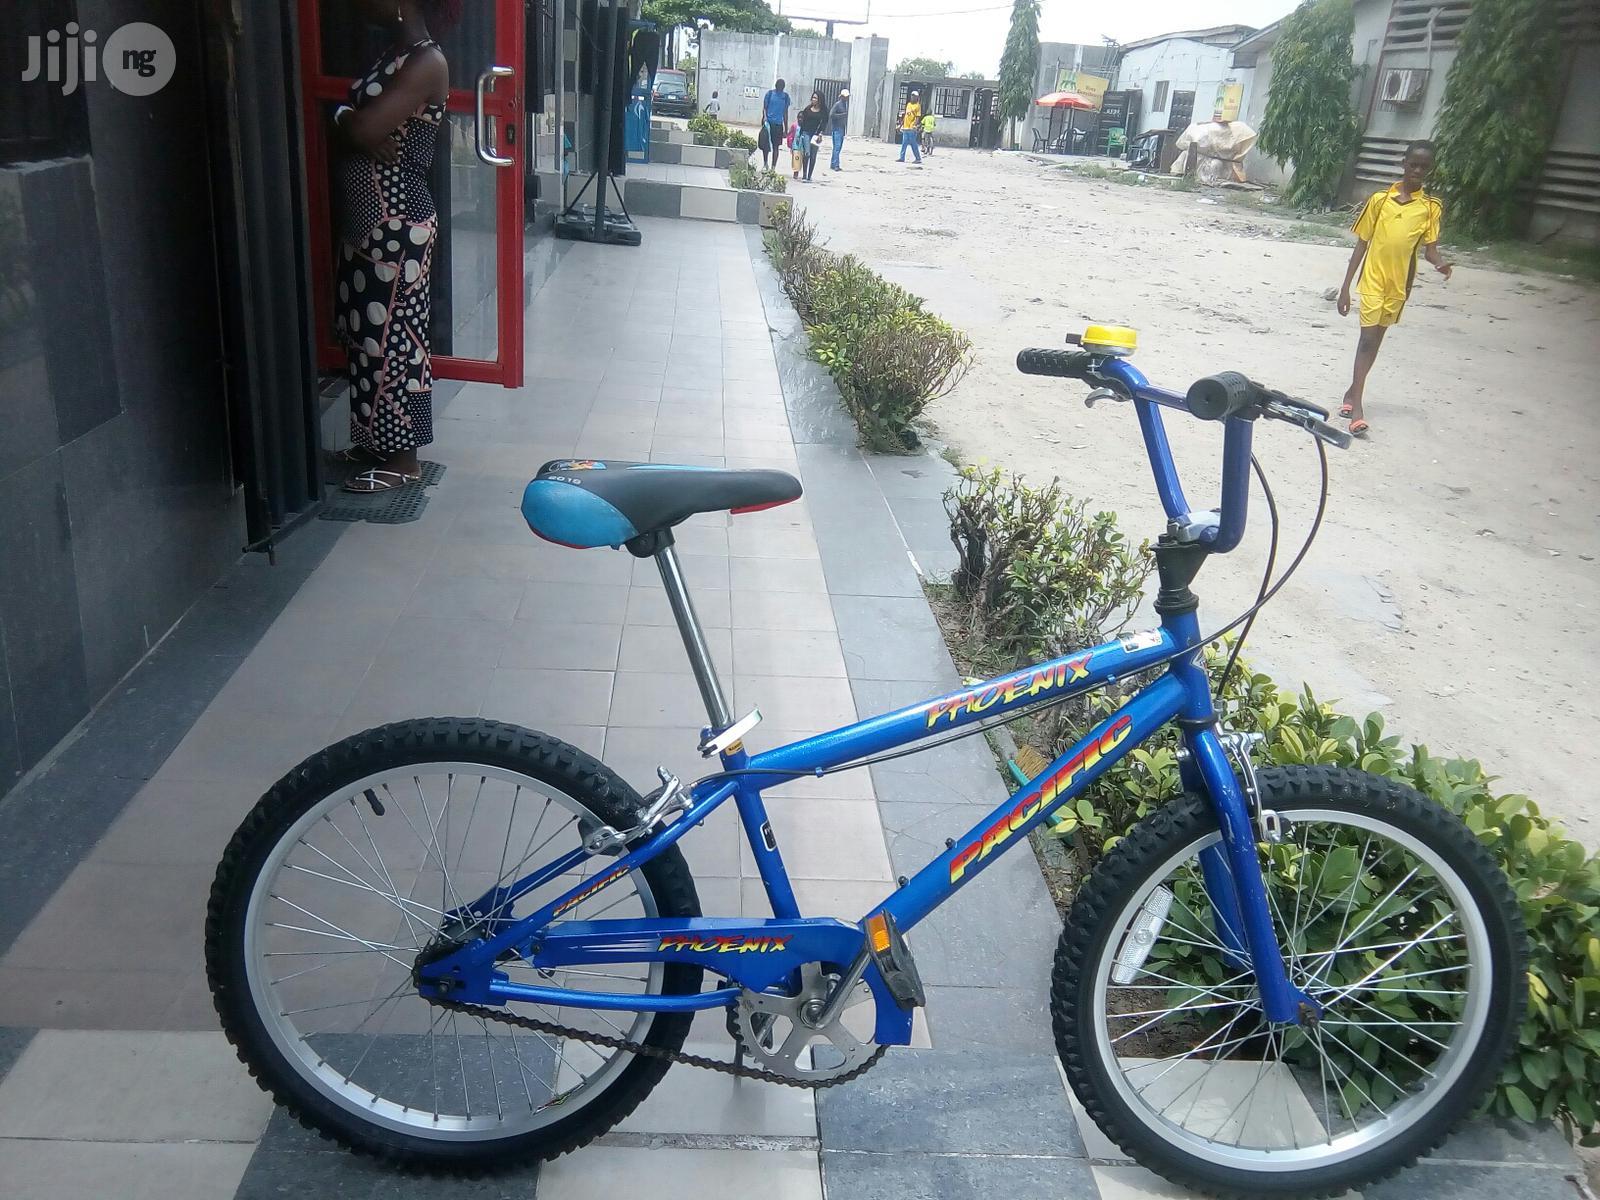 Phoenix Children Bicycle 20 Inches